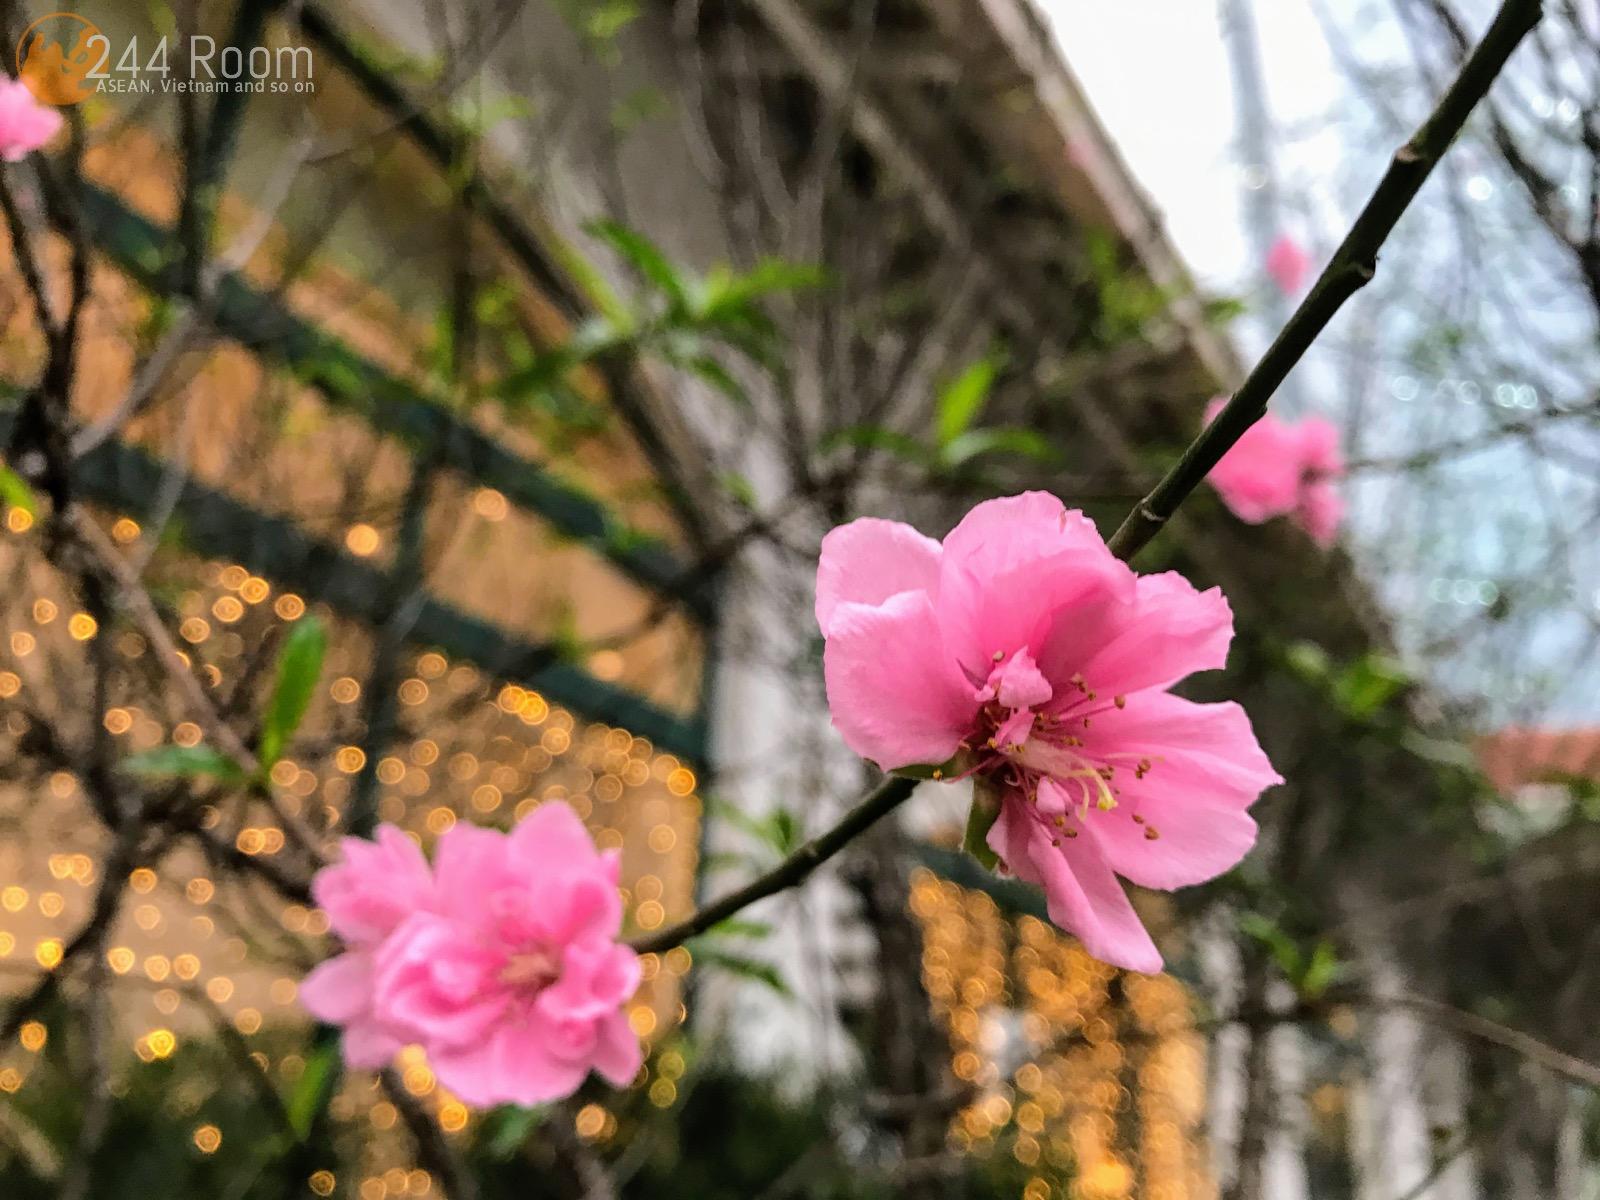 Peach-blossom-hanoi ハノイの桃の花